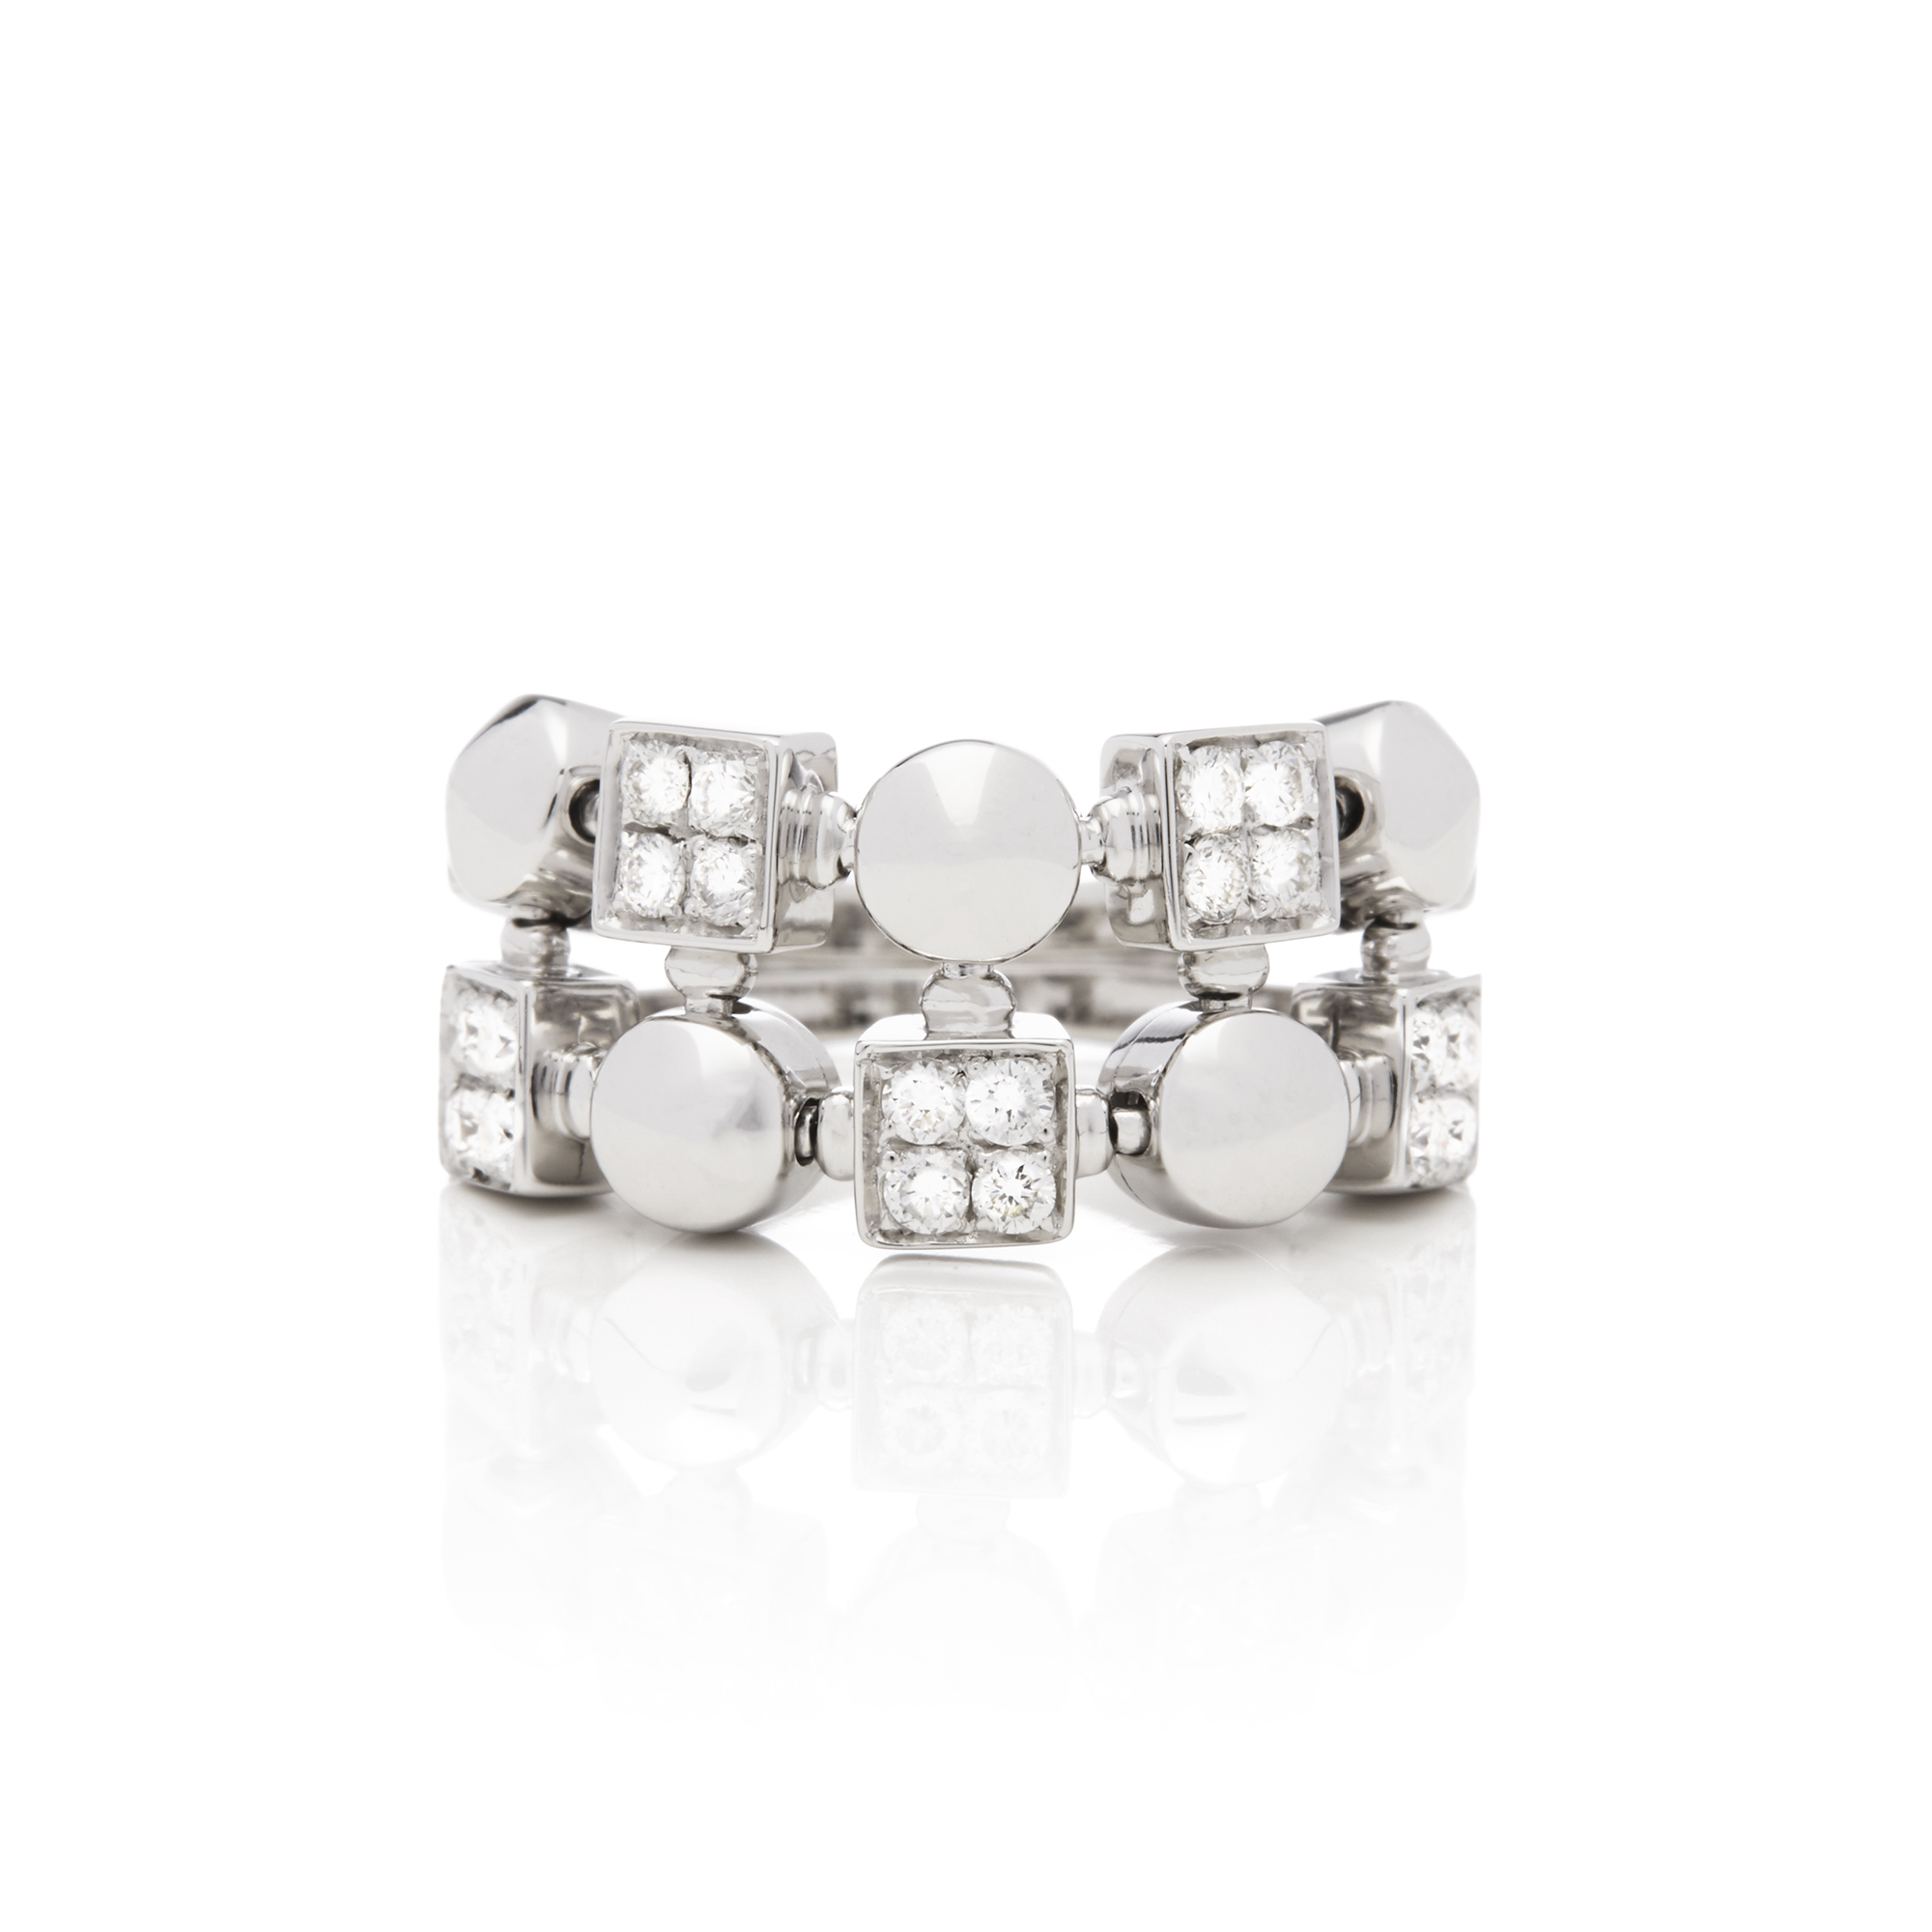 Bulgari 18ct White Gold Lucéa Diamond Ring - Image 7 of 7